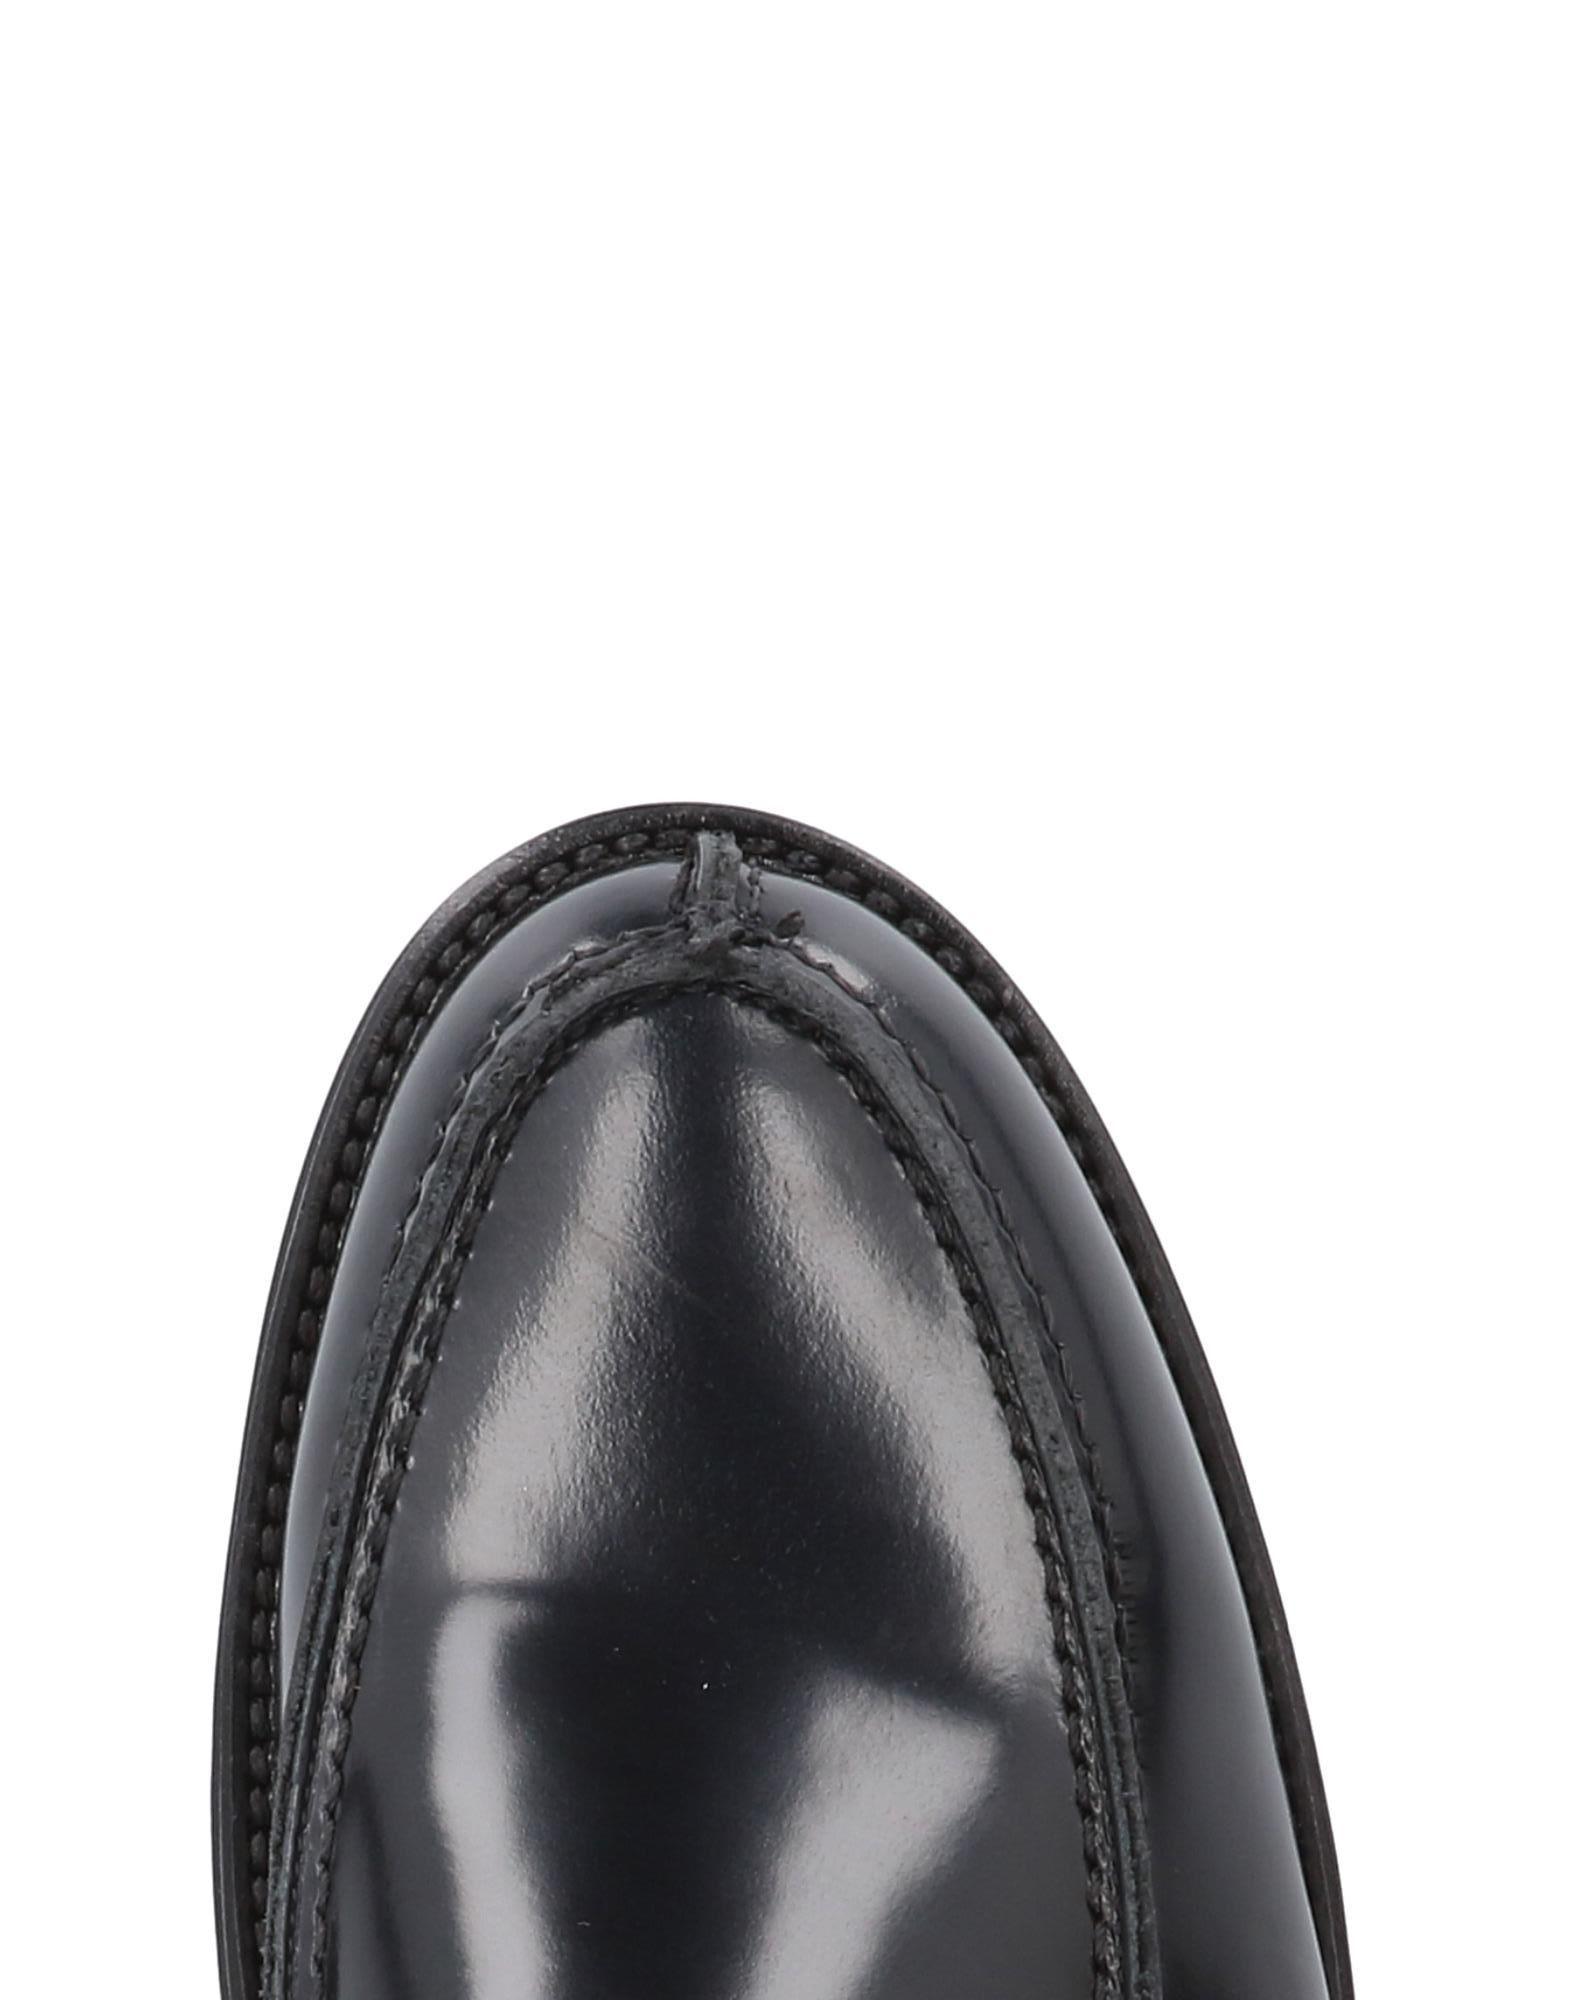 Officine Mokassins Del Cuoio Mokassins Officine Herren  11485280MV Neue Schuhe bd49e4